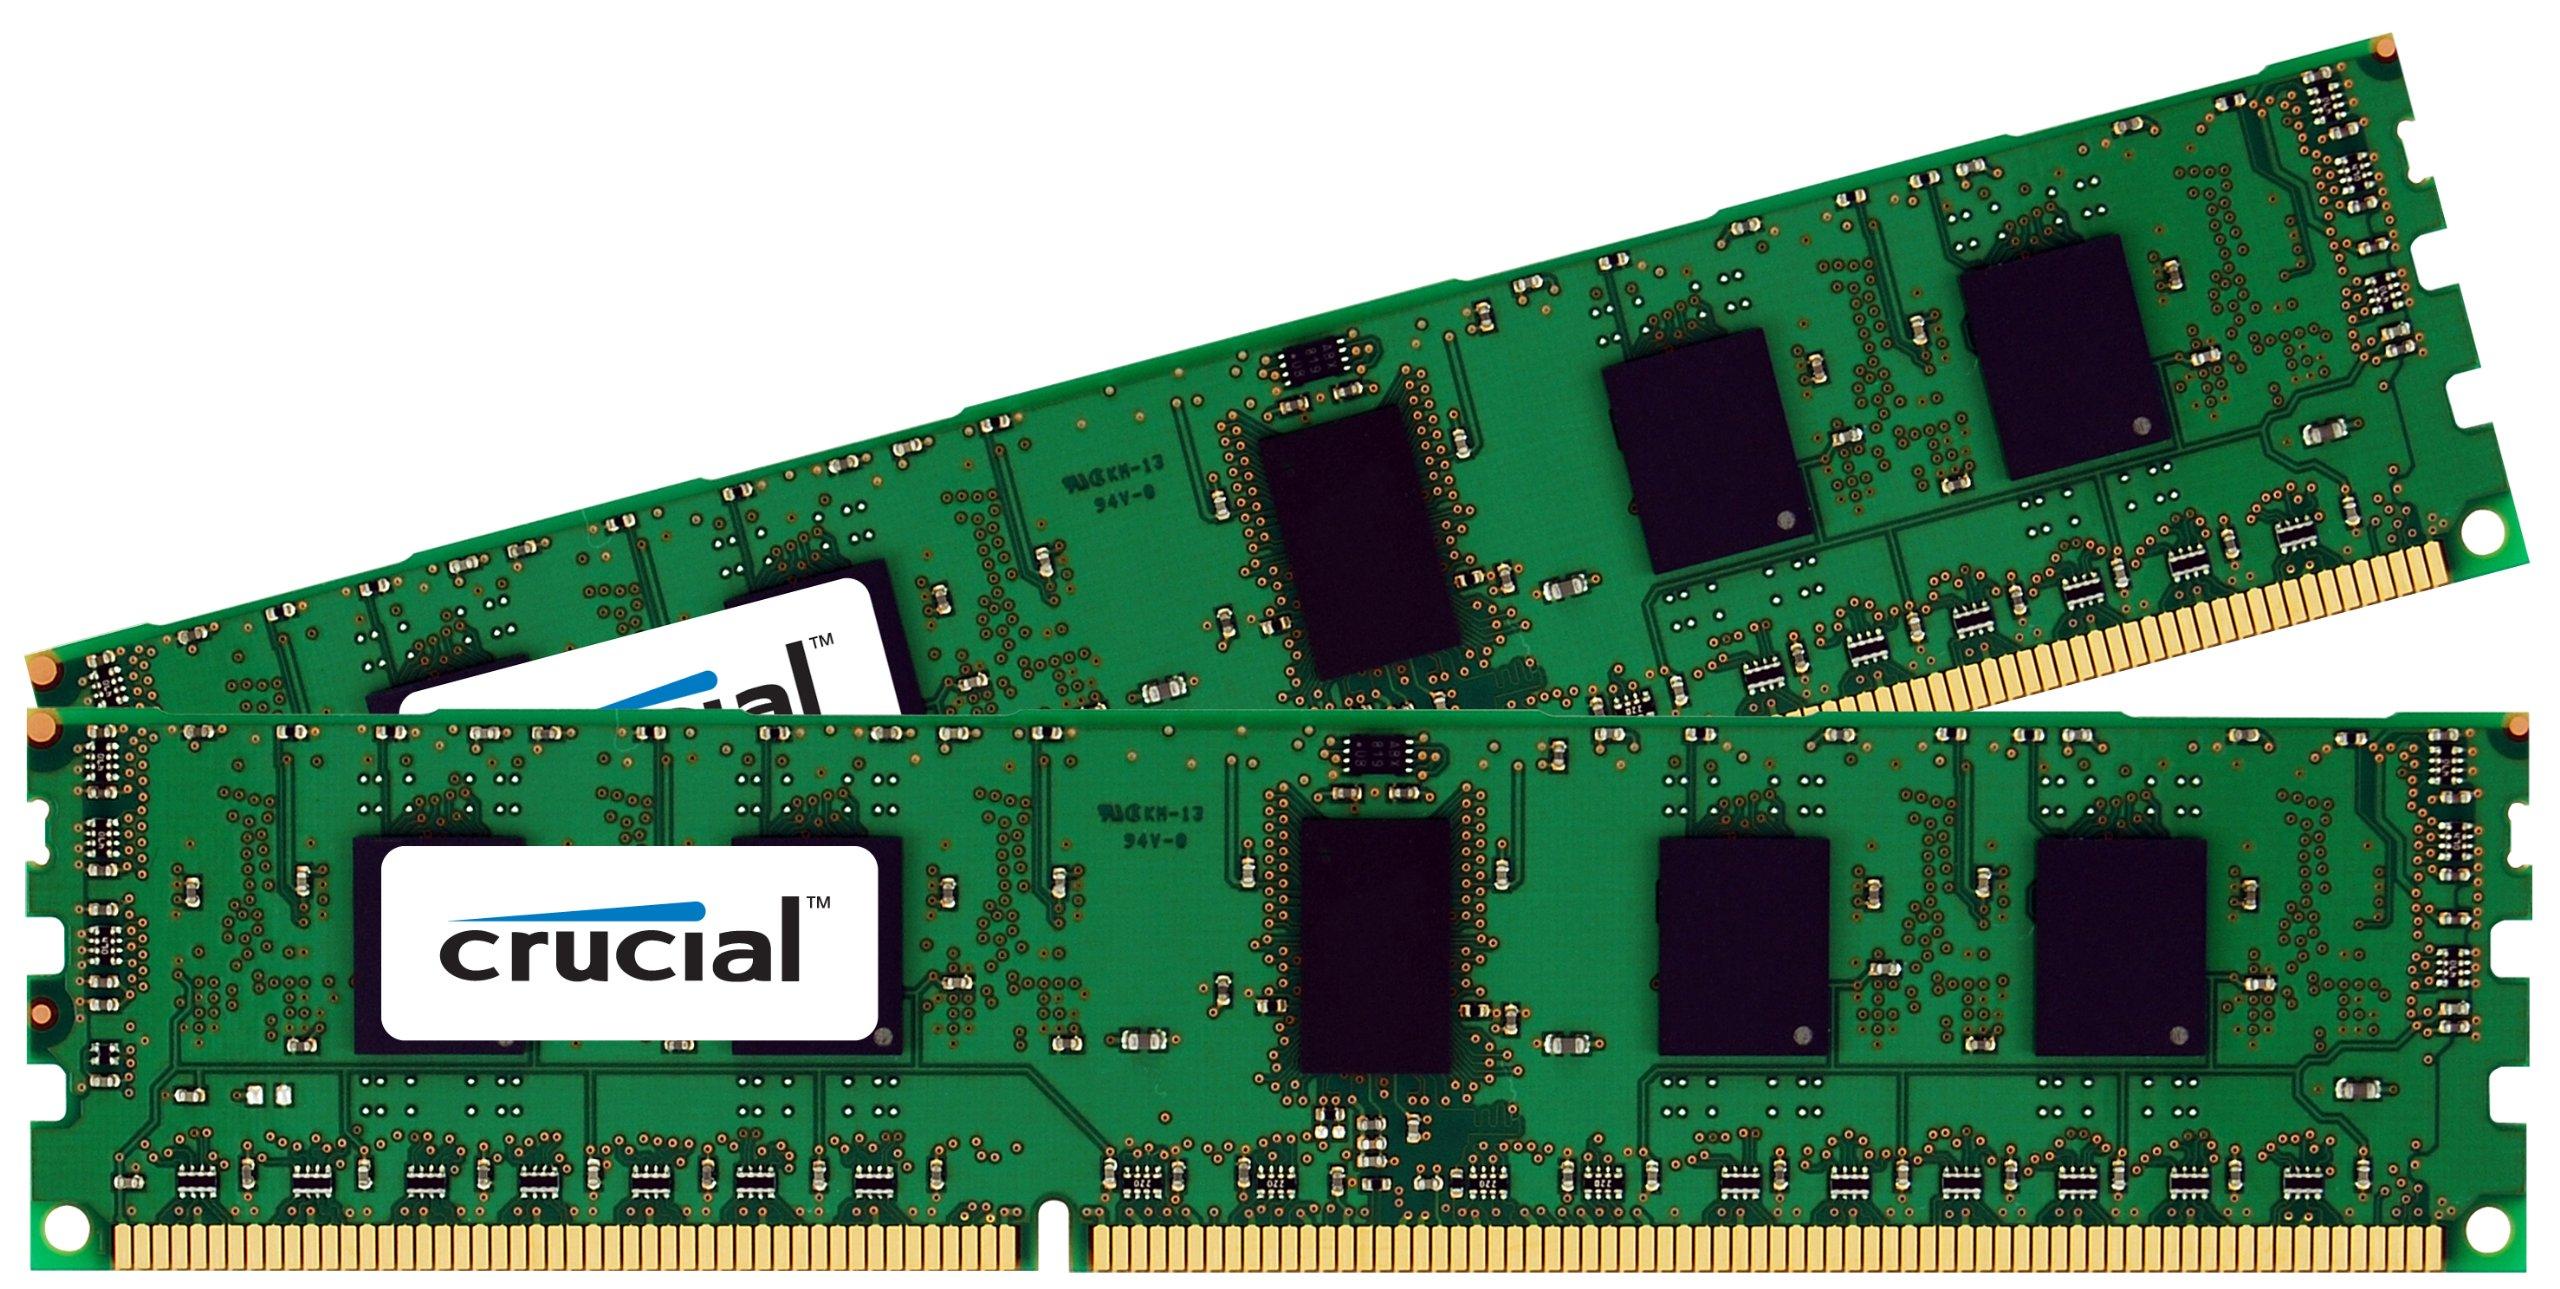 Crucial 16GB Kit (8GBx2) DDR3 1333 MT/s (PC3-10600) CL9 240-Pin Unbuffered UDIMM Desktop Memory CT2CP102464BA1339